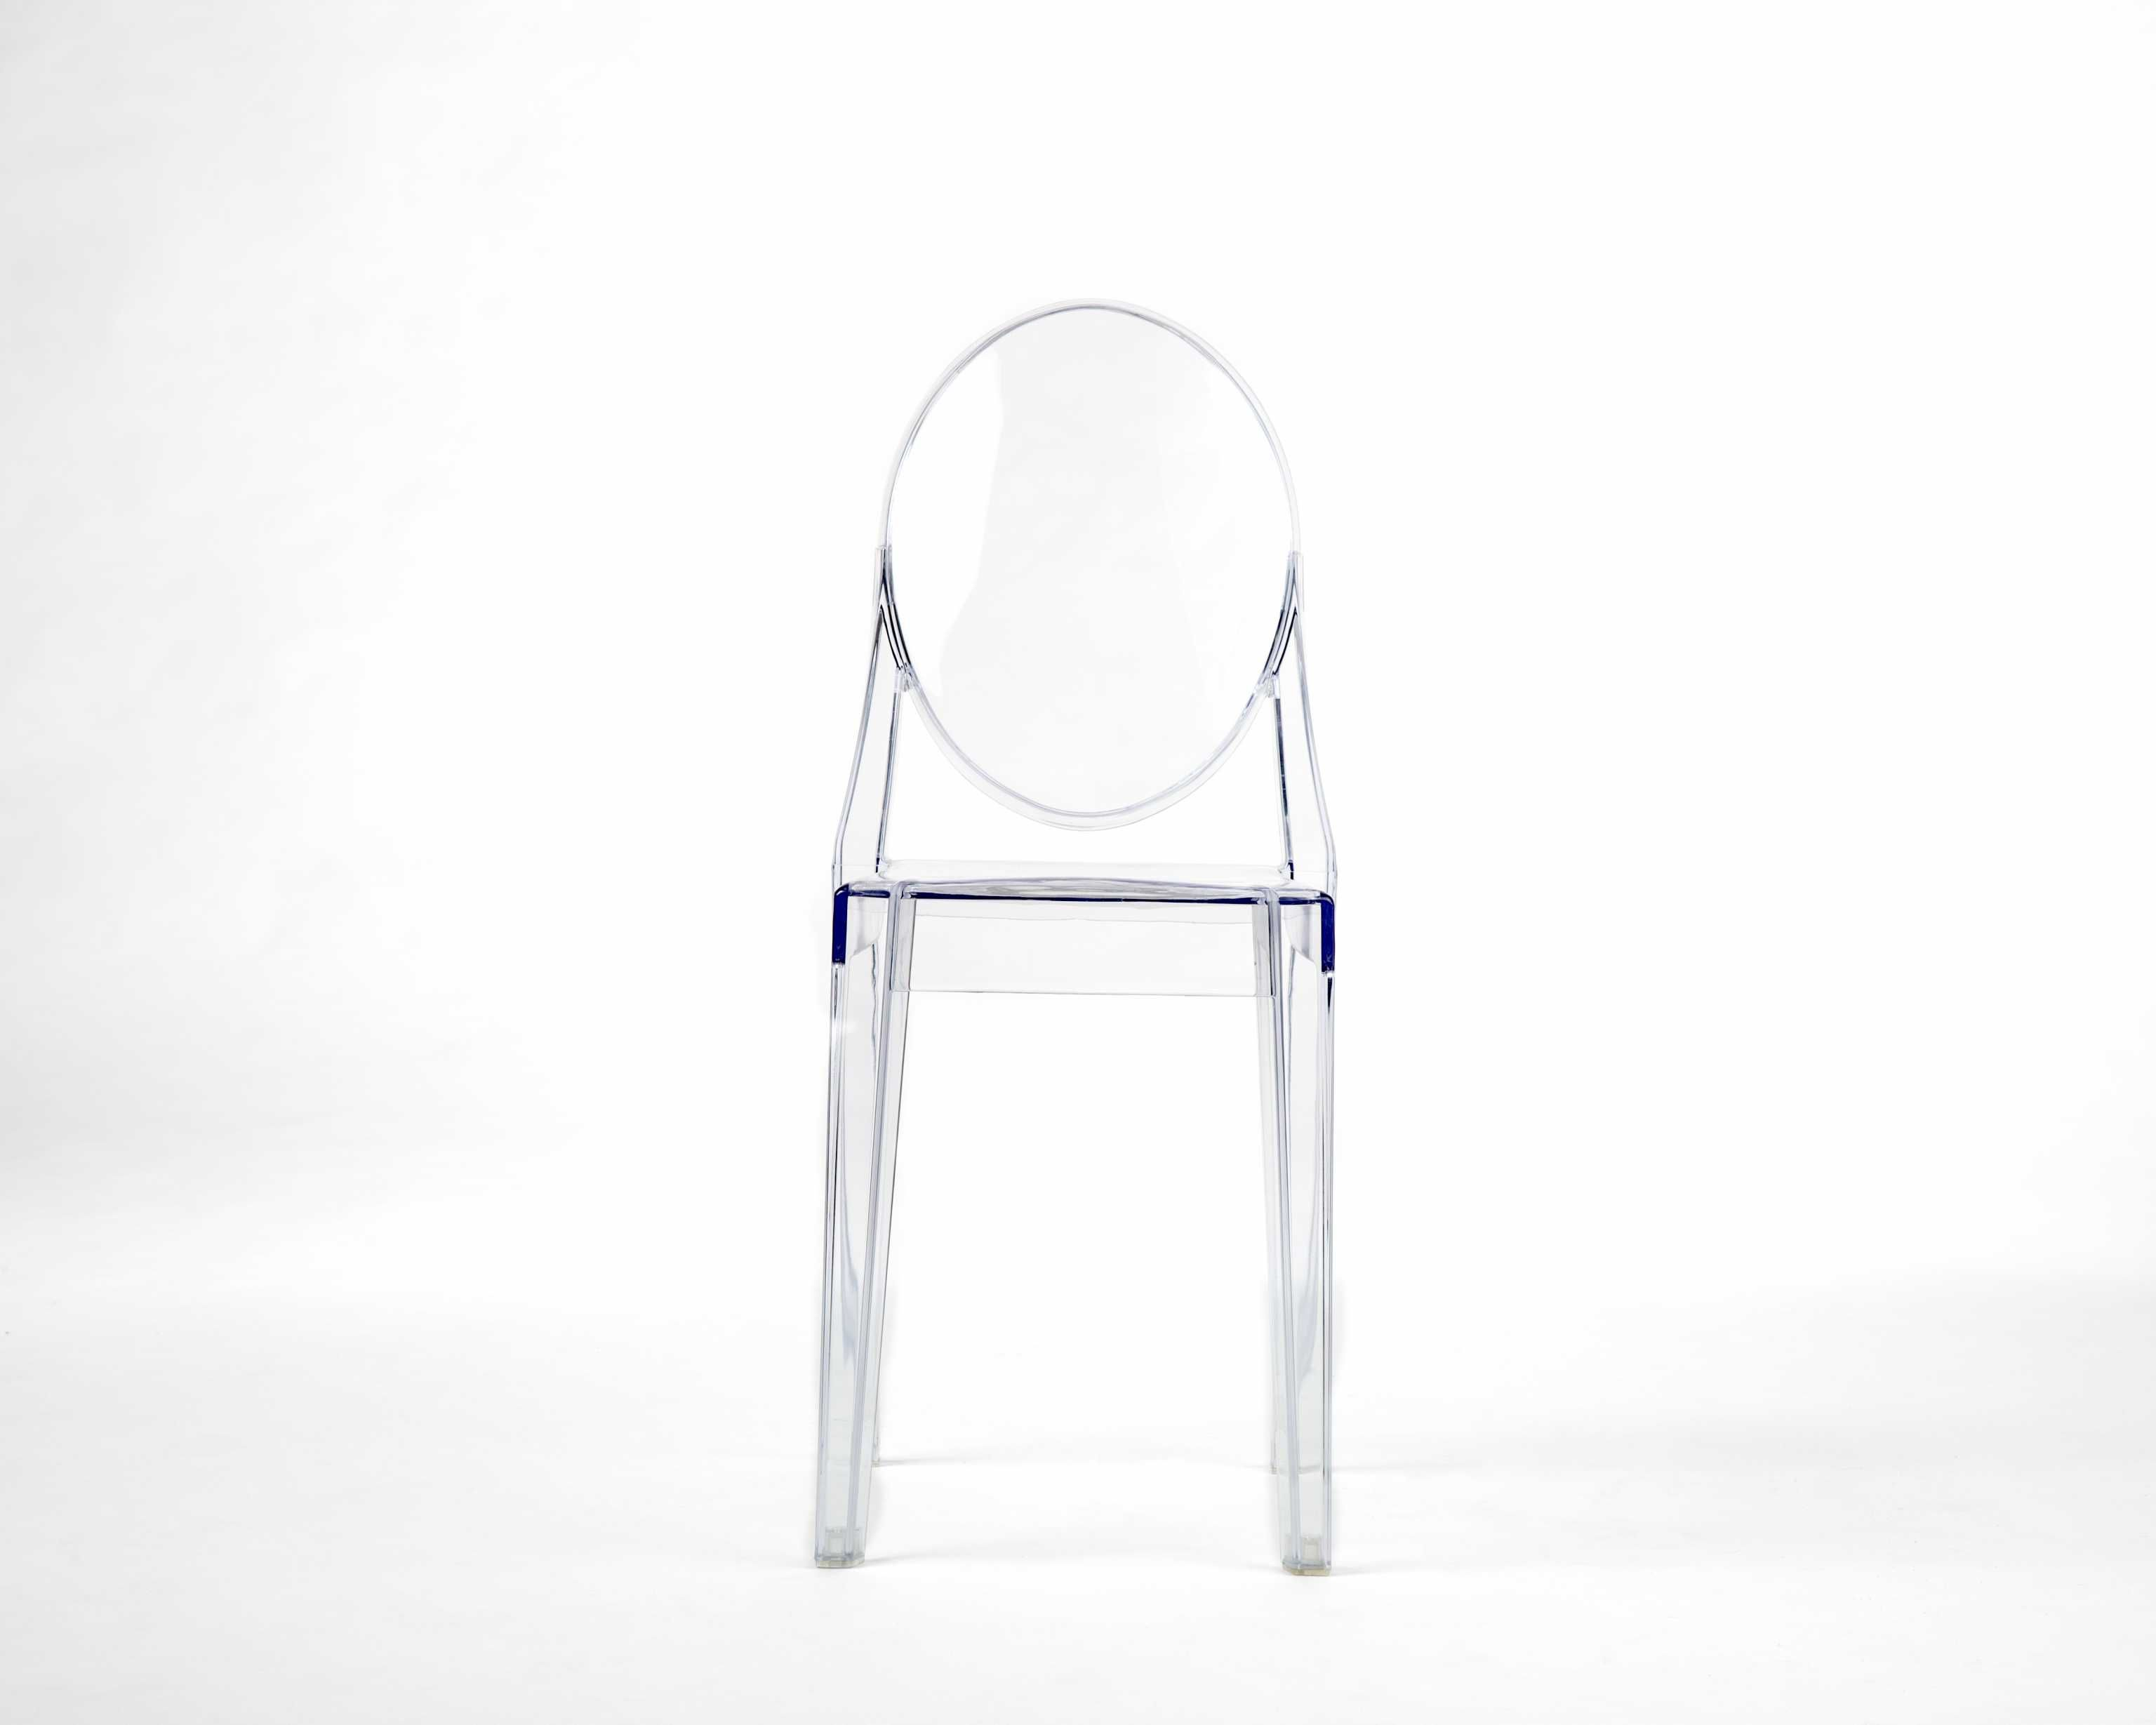 Ghost chair victoria rove concepts chair unique